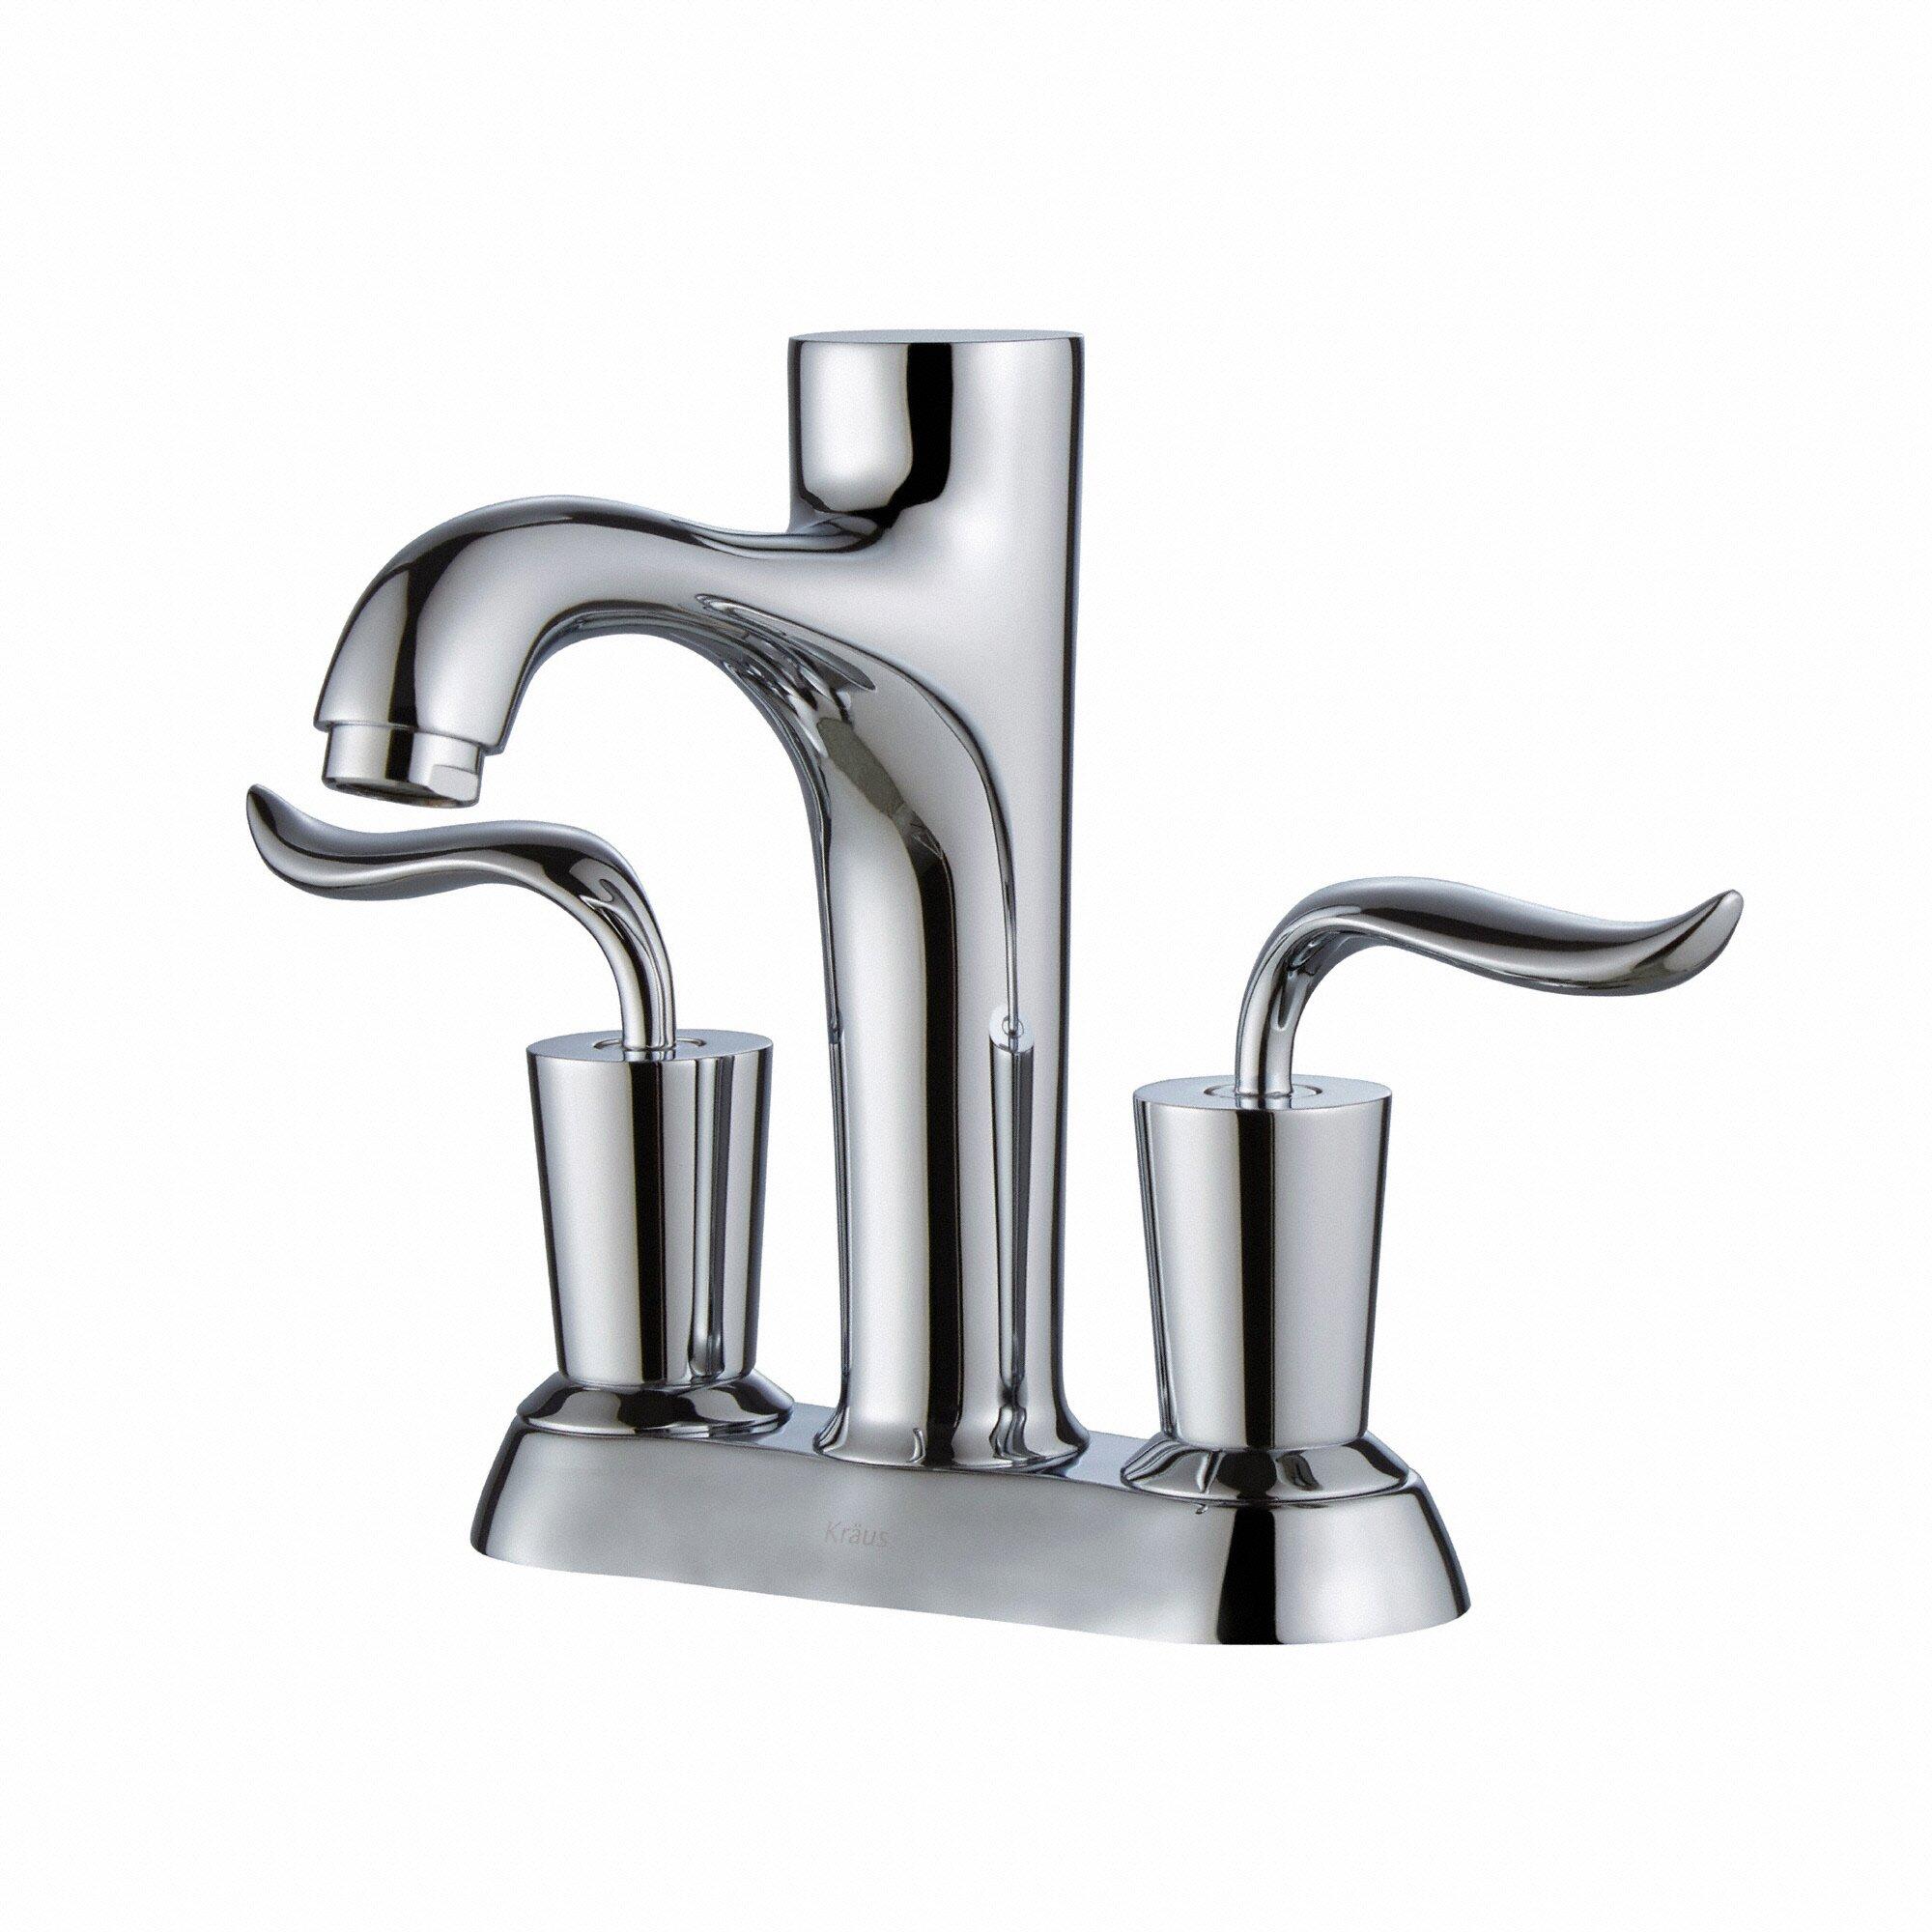 Kraus Faucets Reviews : Kraus Coda Double Handle Centerset Bathroom Faucet & Reviews Wayfair